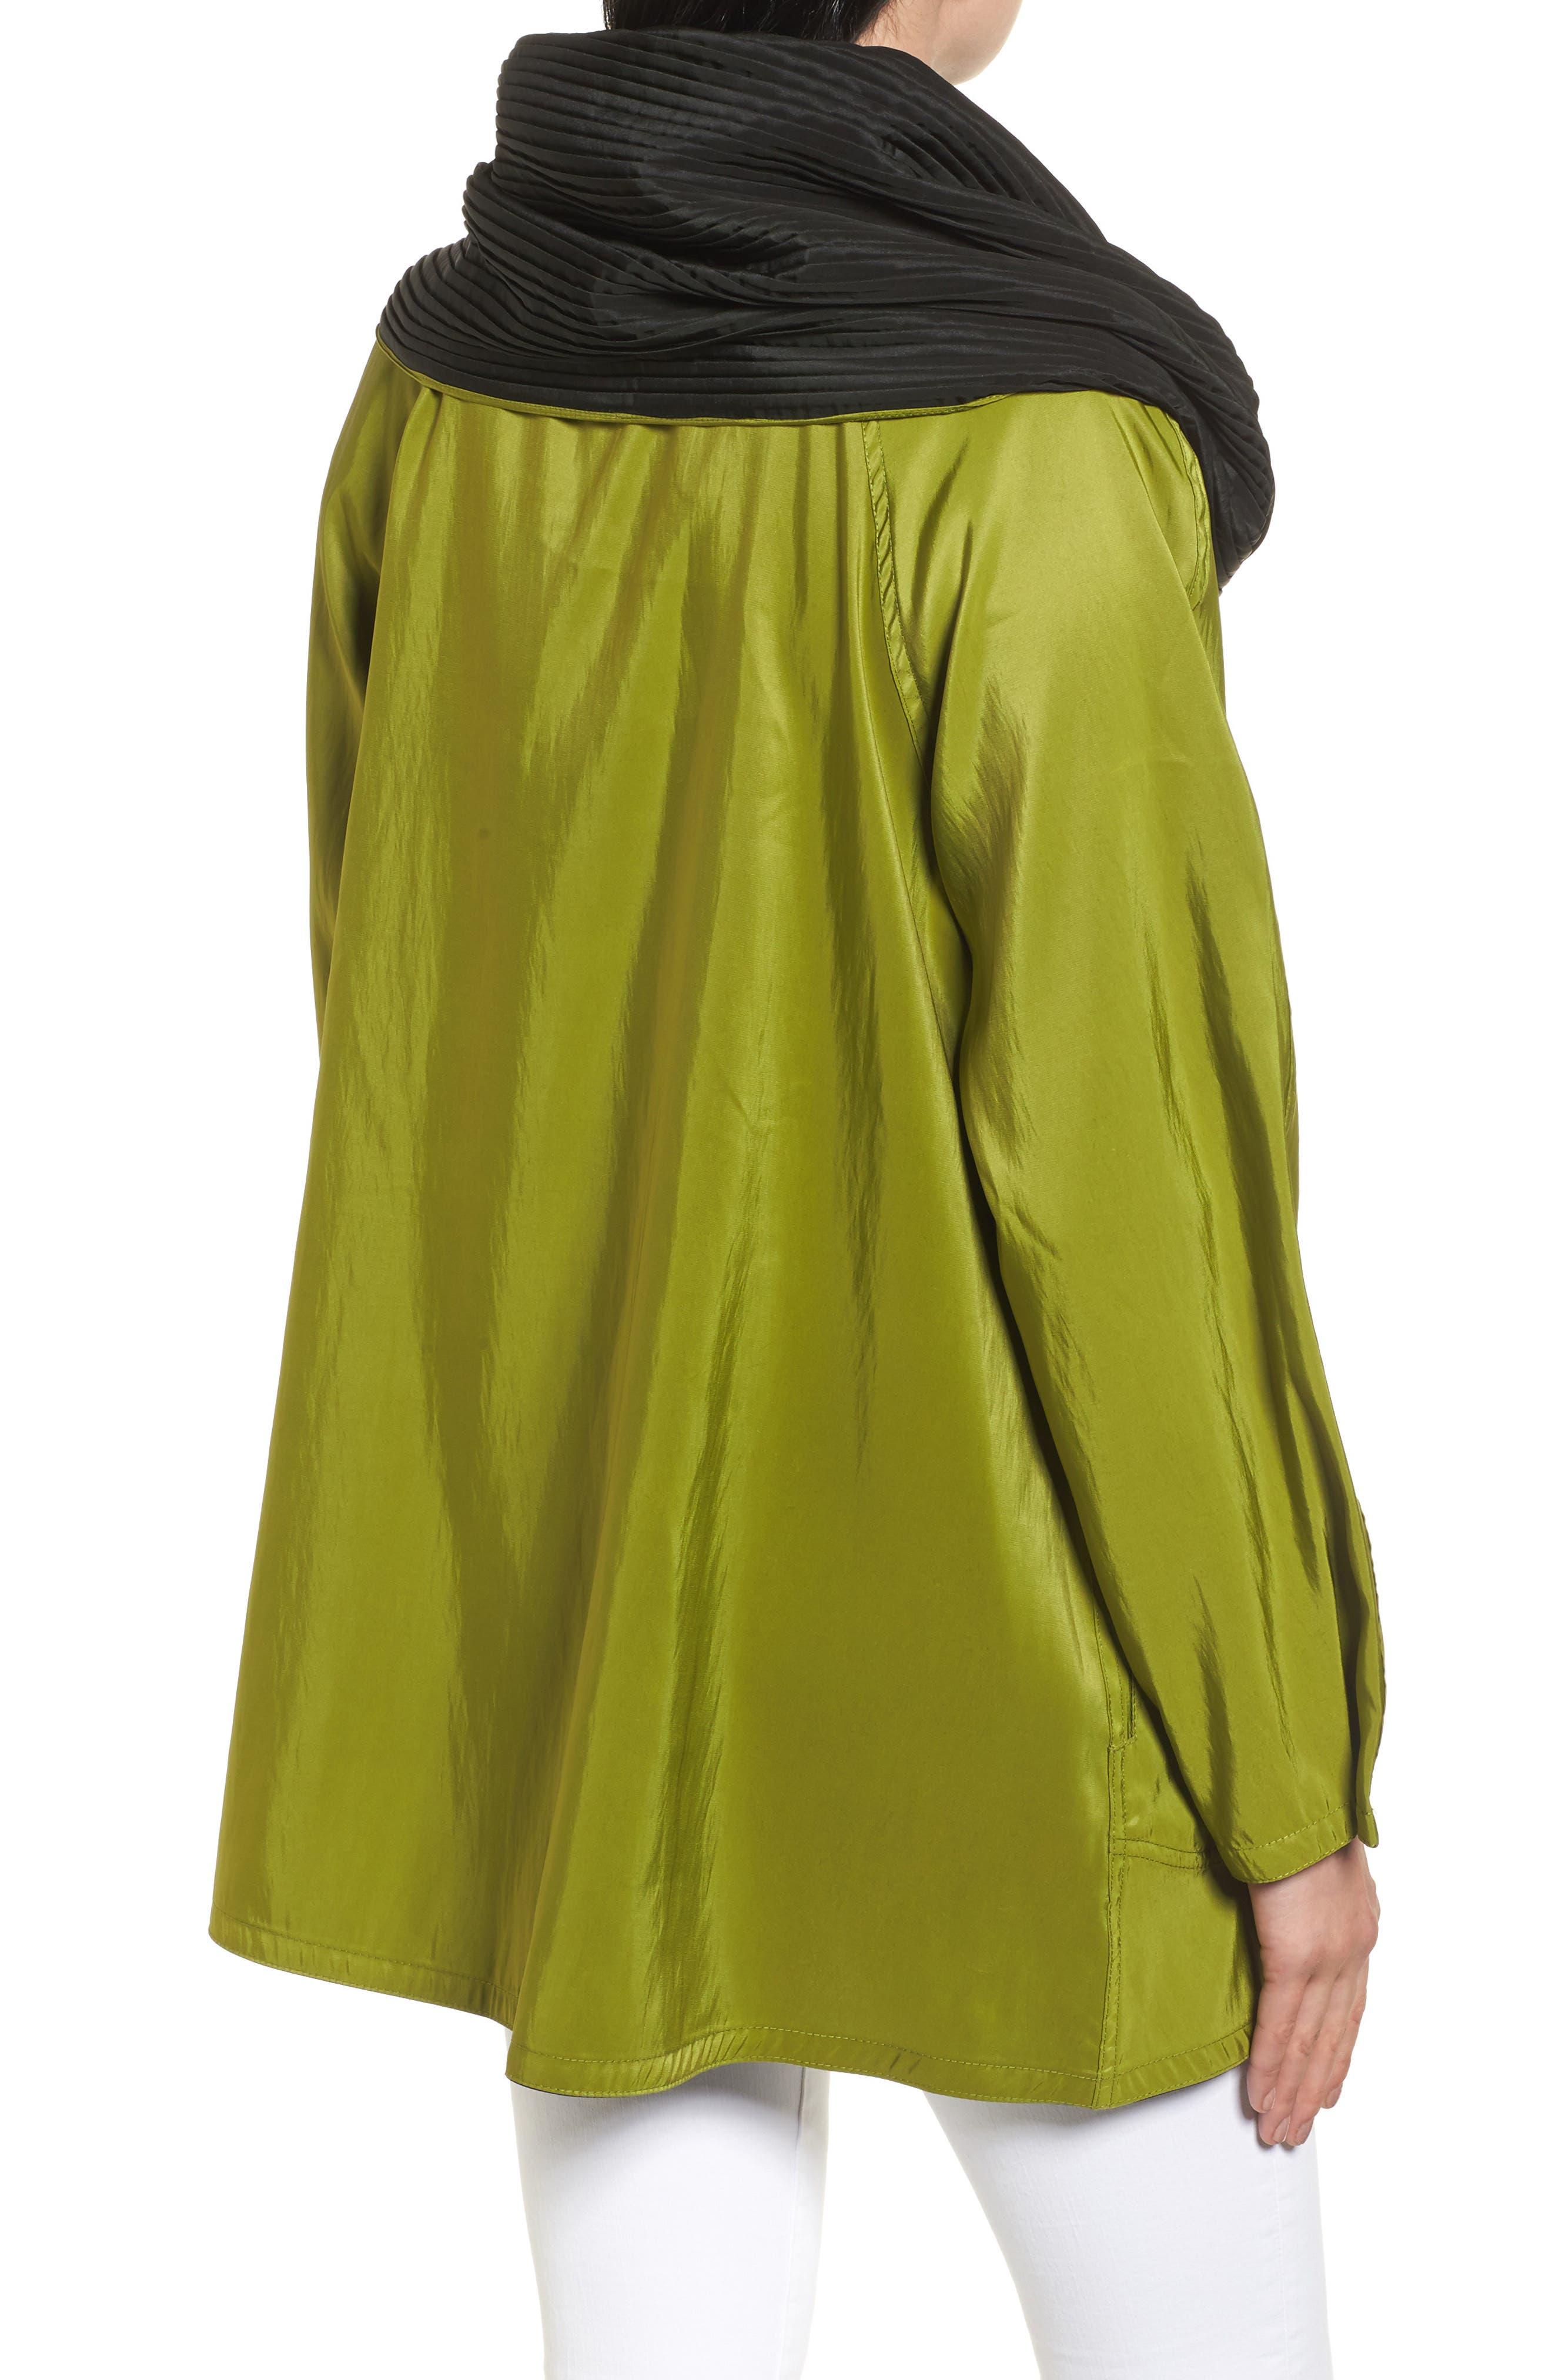 'Mini Donatella' Reversible Pleat Hood Packable Travel Coat,                             Alternate thumbnail 2, color,                             316